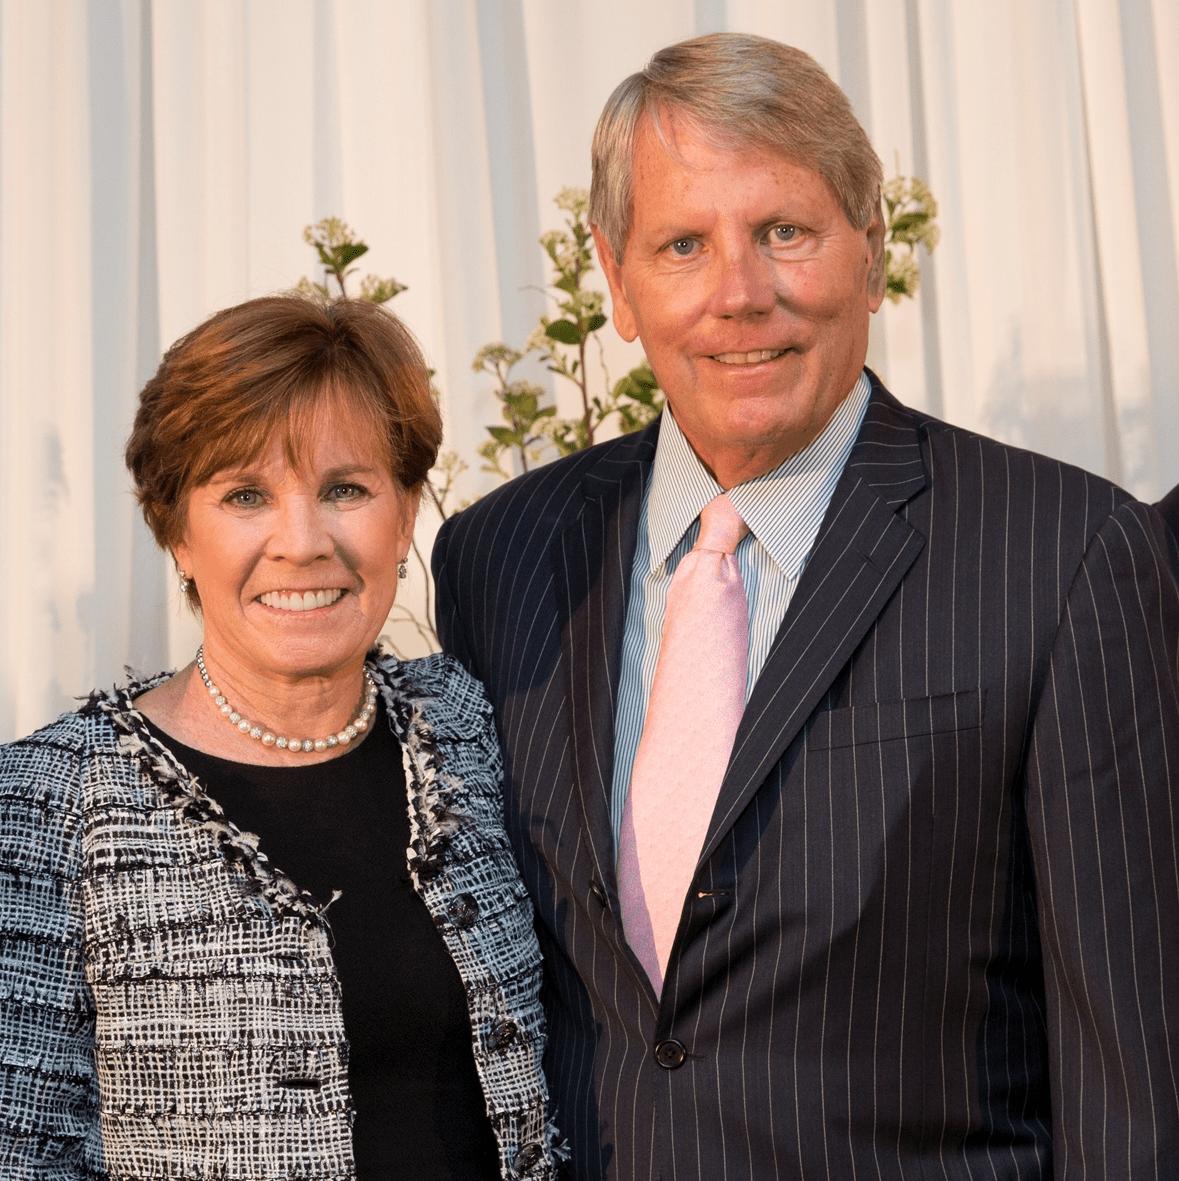 Houston, Menninger Clinic Annual Luncheon, May 2016, Maureen Hackett, Robert C. Wilson III